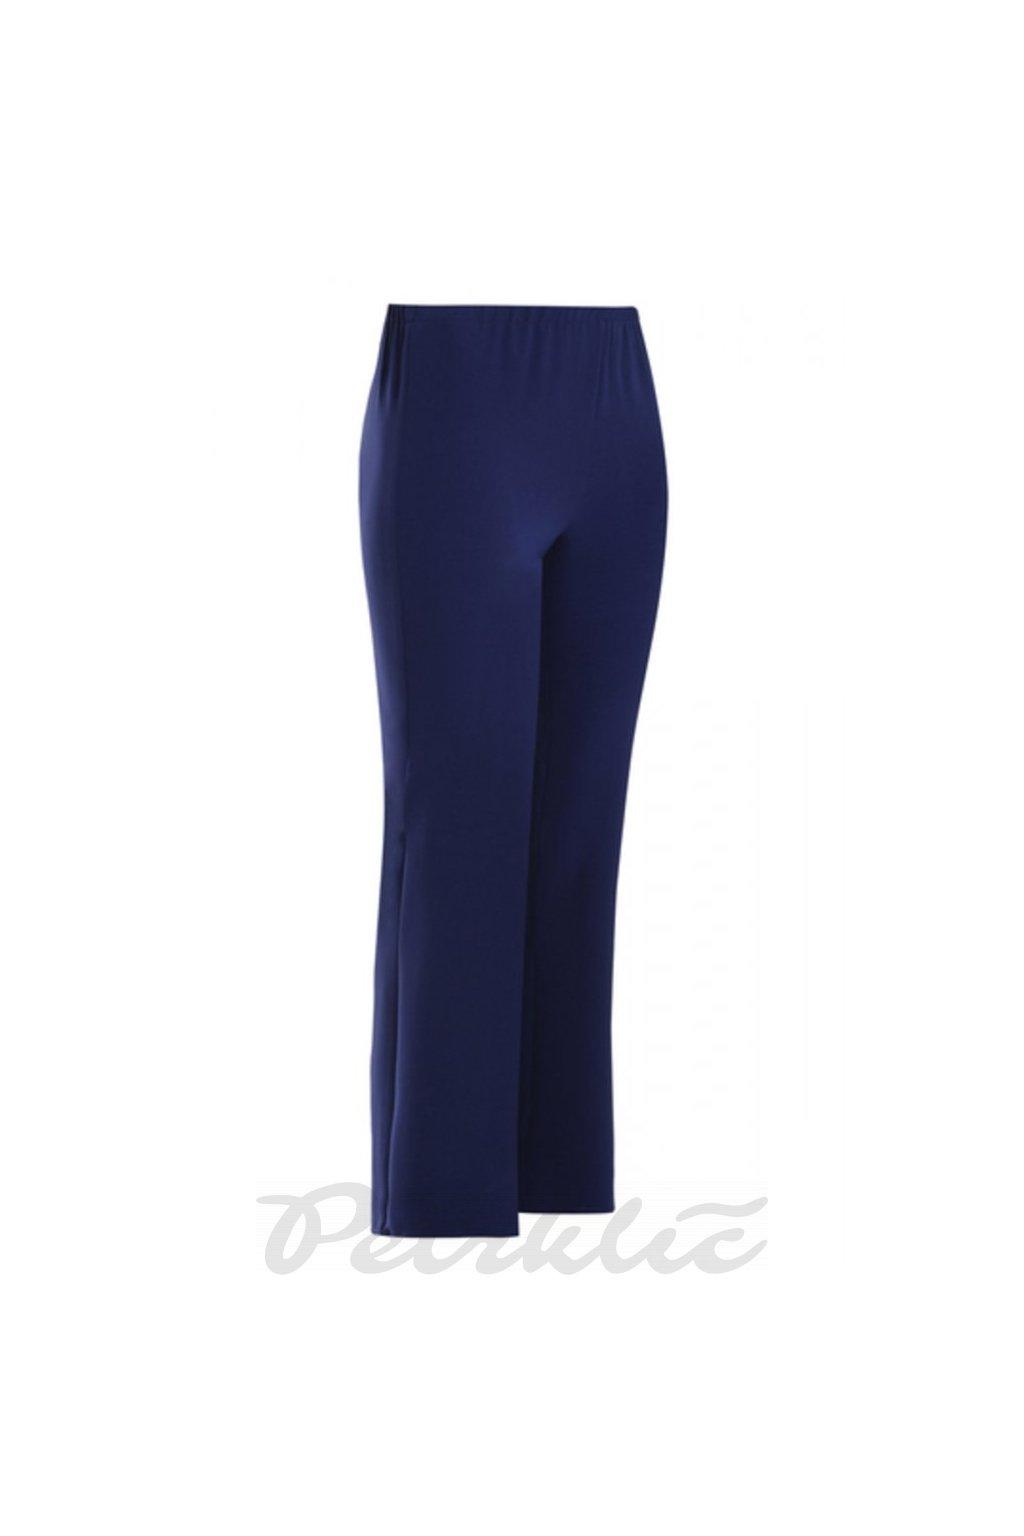 ŠIMON - kalhoty 95 - 100 cm